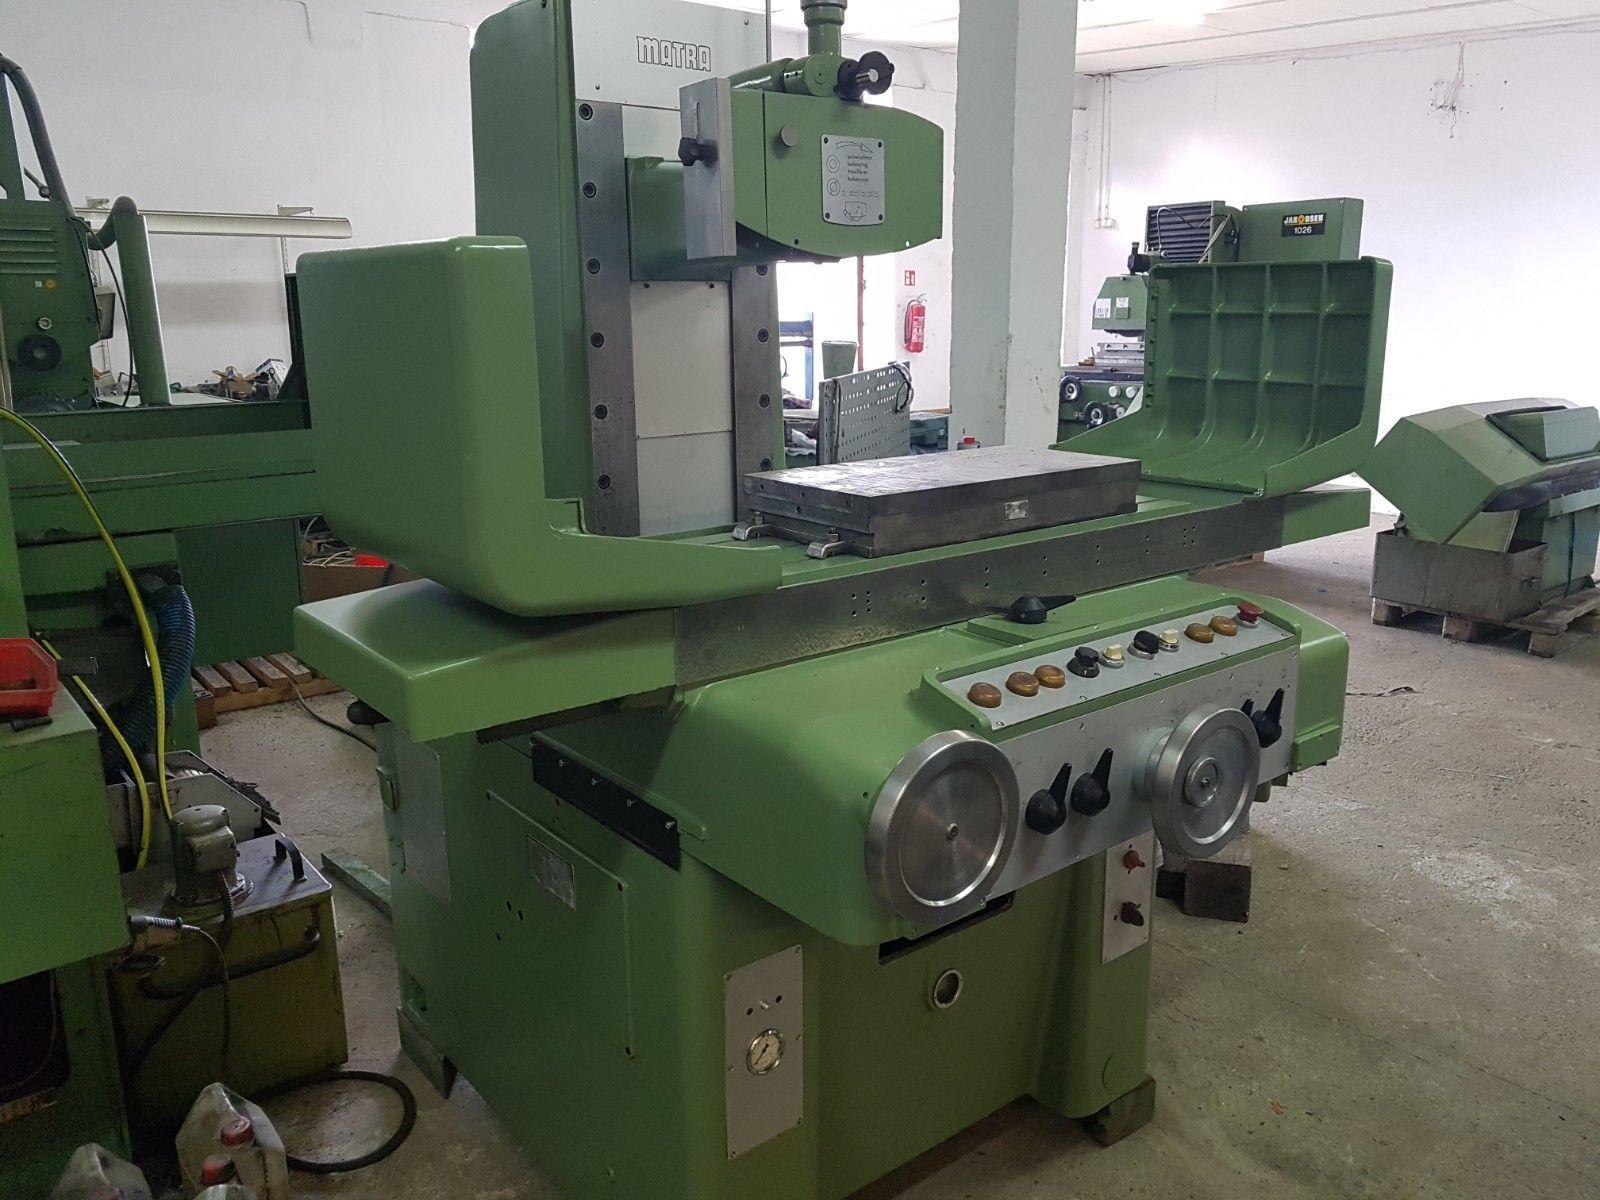 Flachschleifmaschine Fabrikat: MATRA Typ: MF60/40